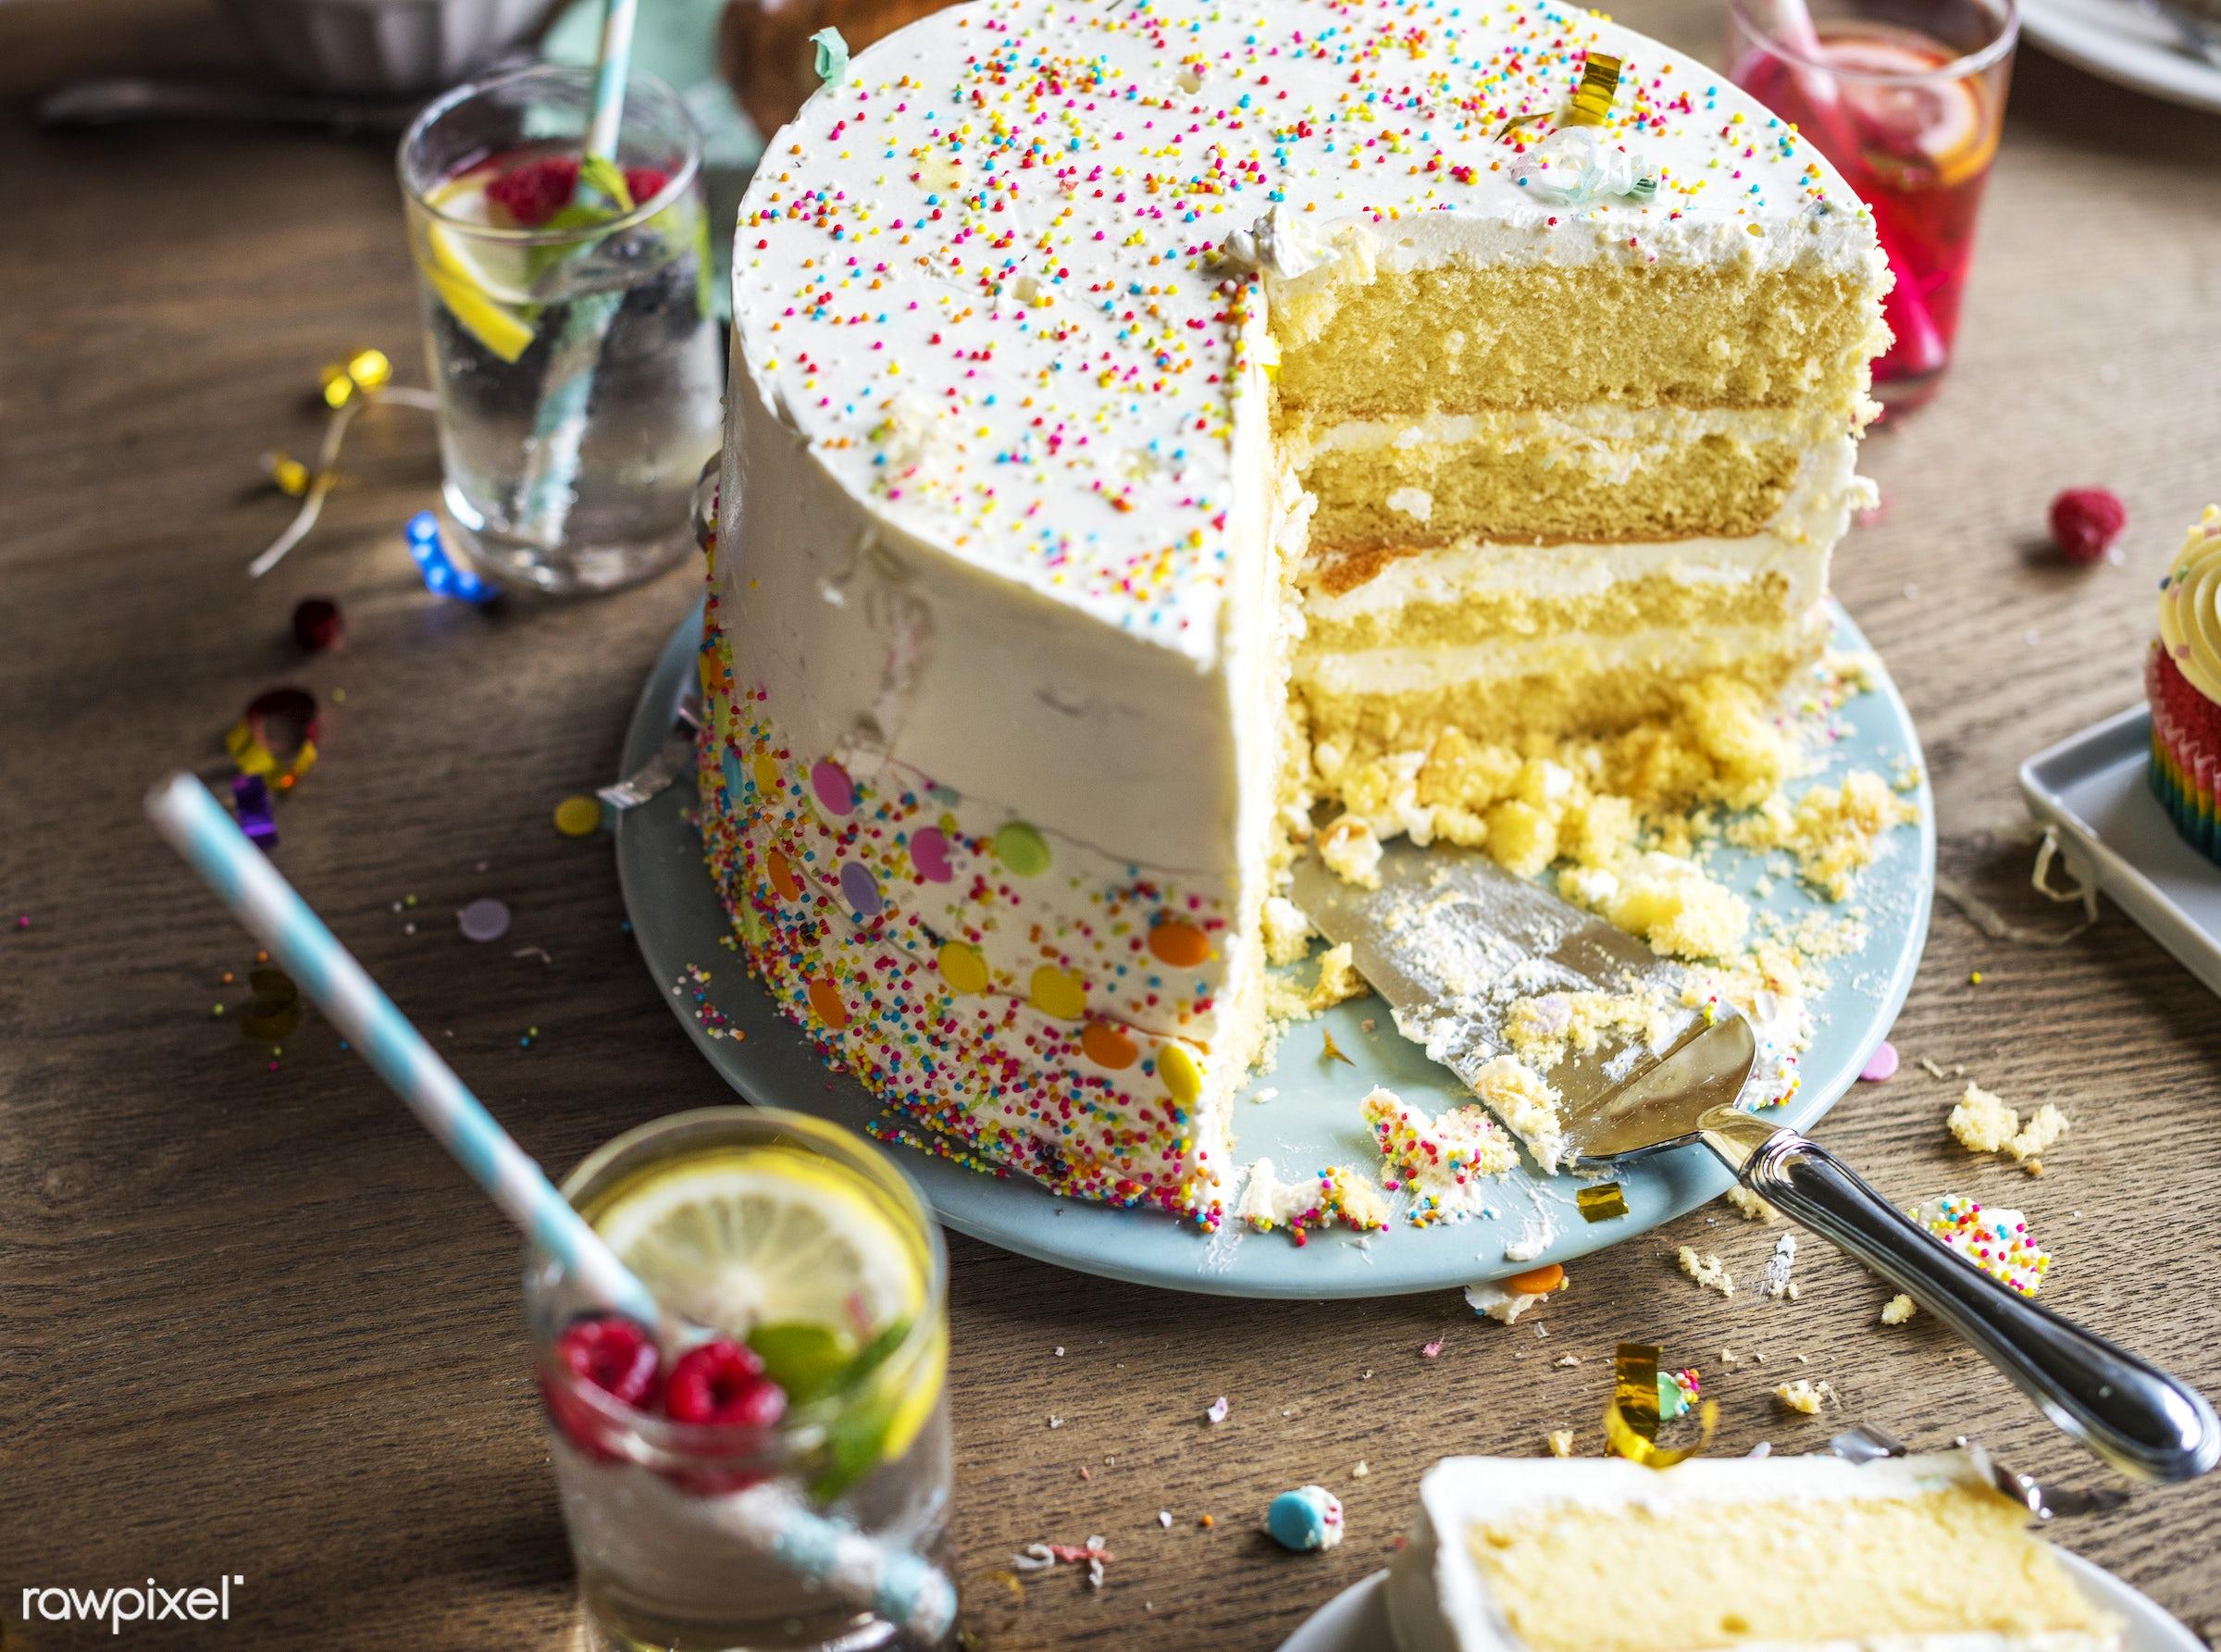 dish, birthday, nobody, recipe, catering, bake, tea, party, baked, tea party, break, bakery, tea break, frosting, event,...